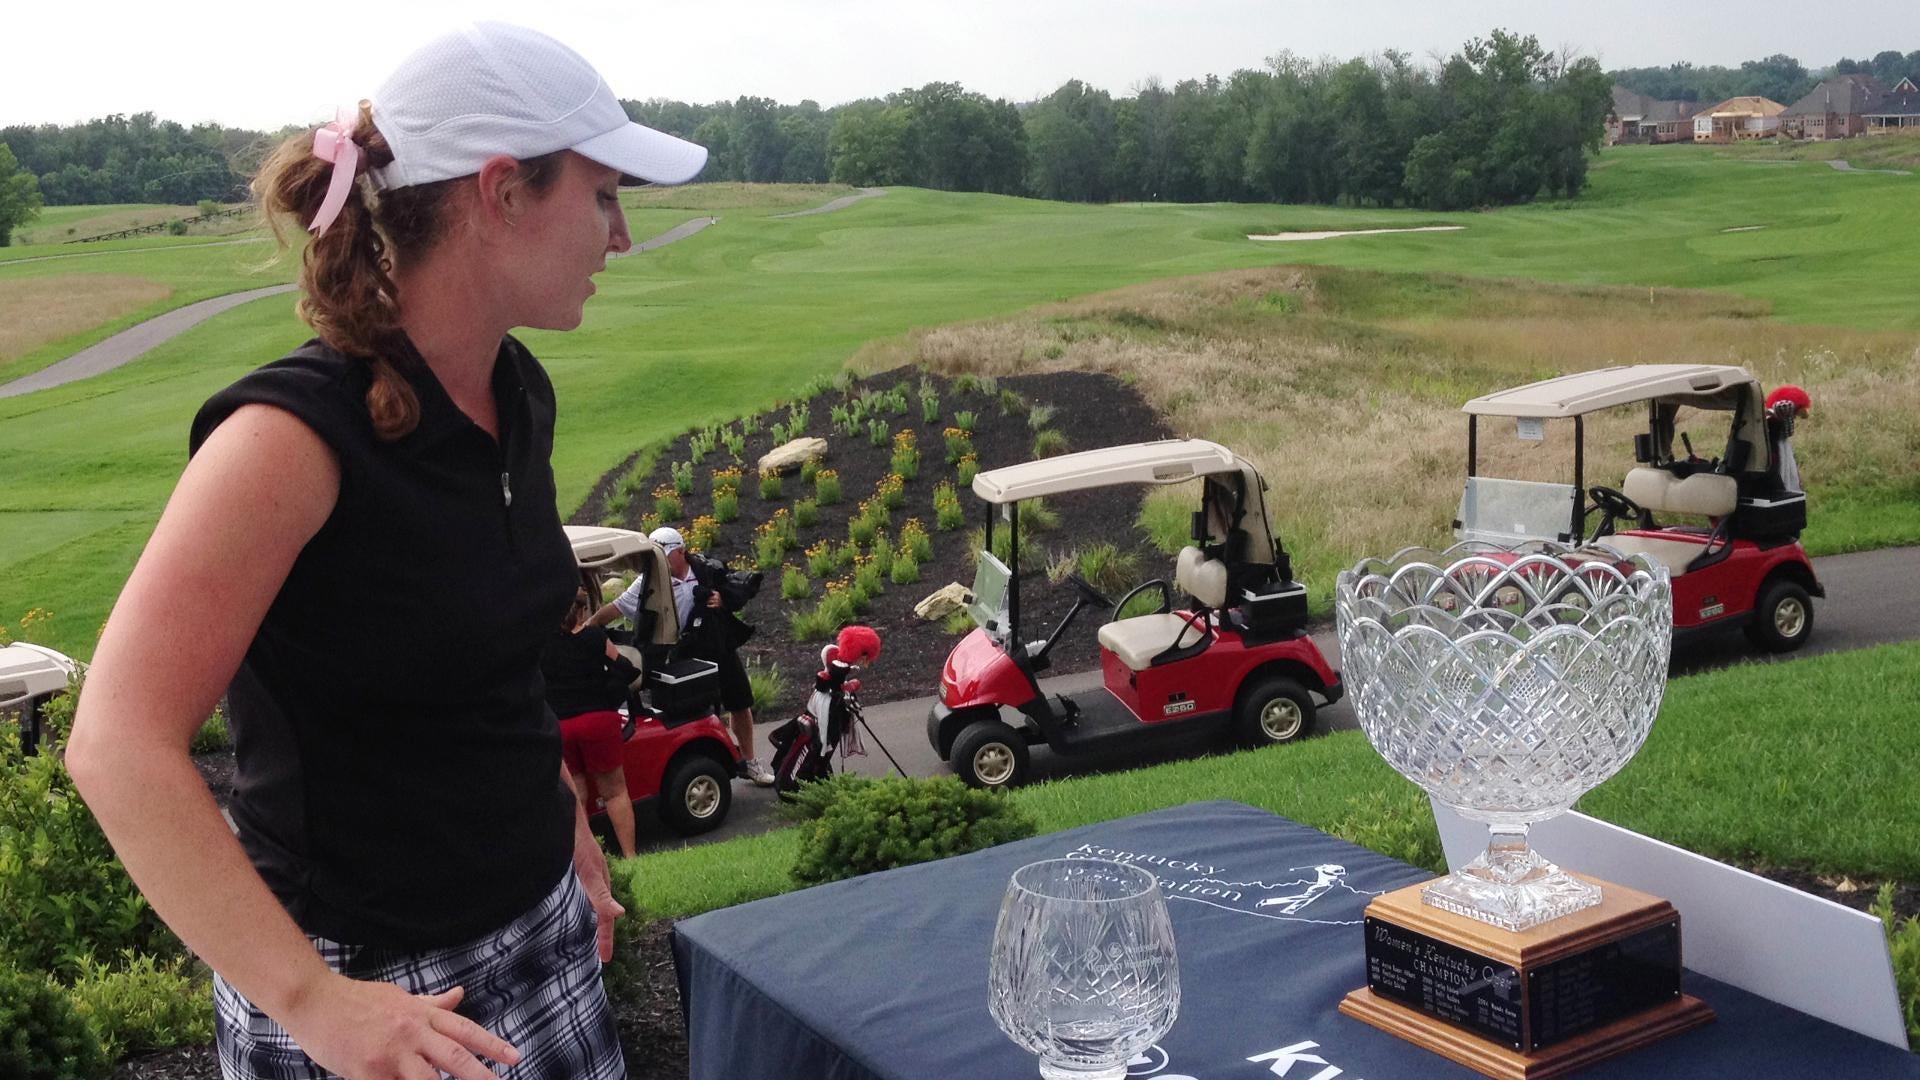 flirting moves that work golf cart cover 2 0